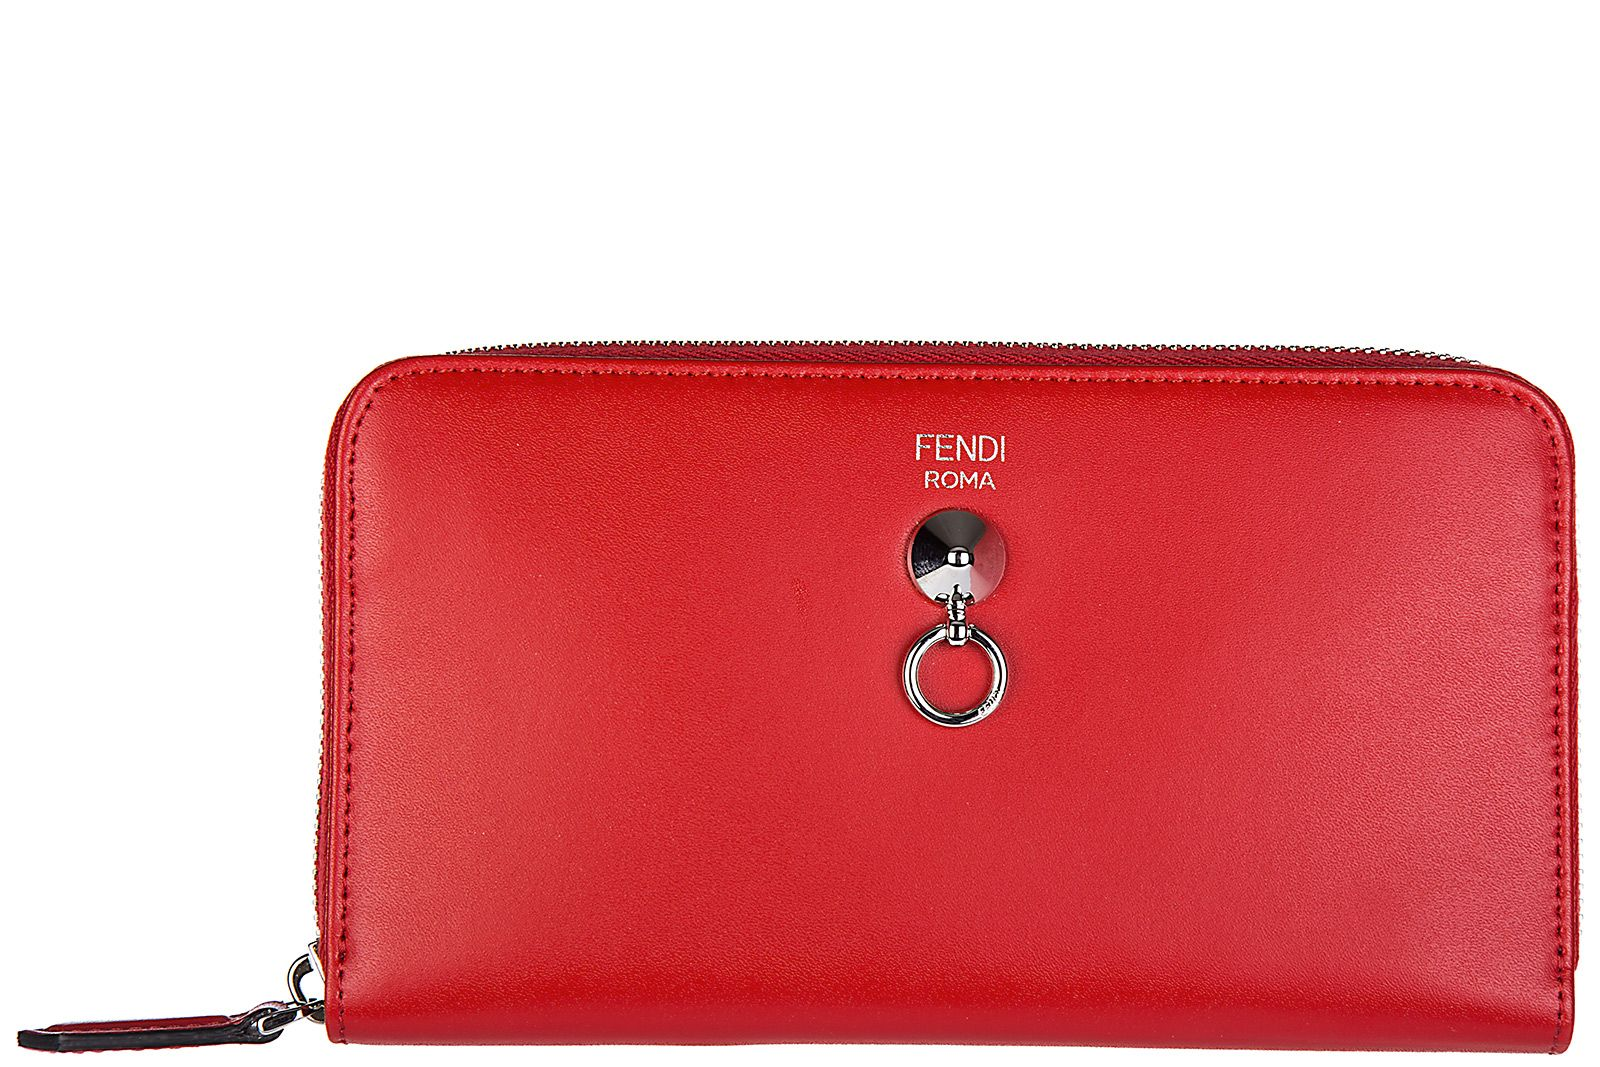 Fendi womens wallet genuine leather coin case holder